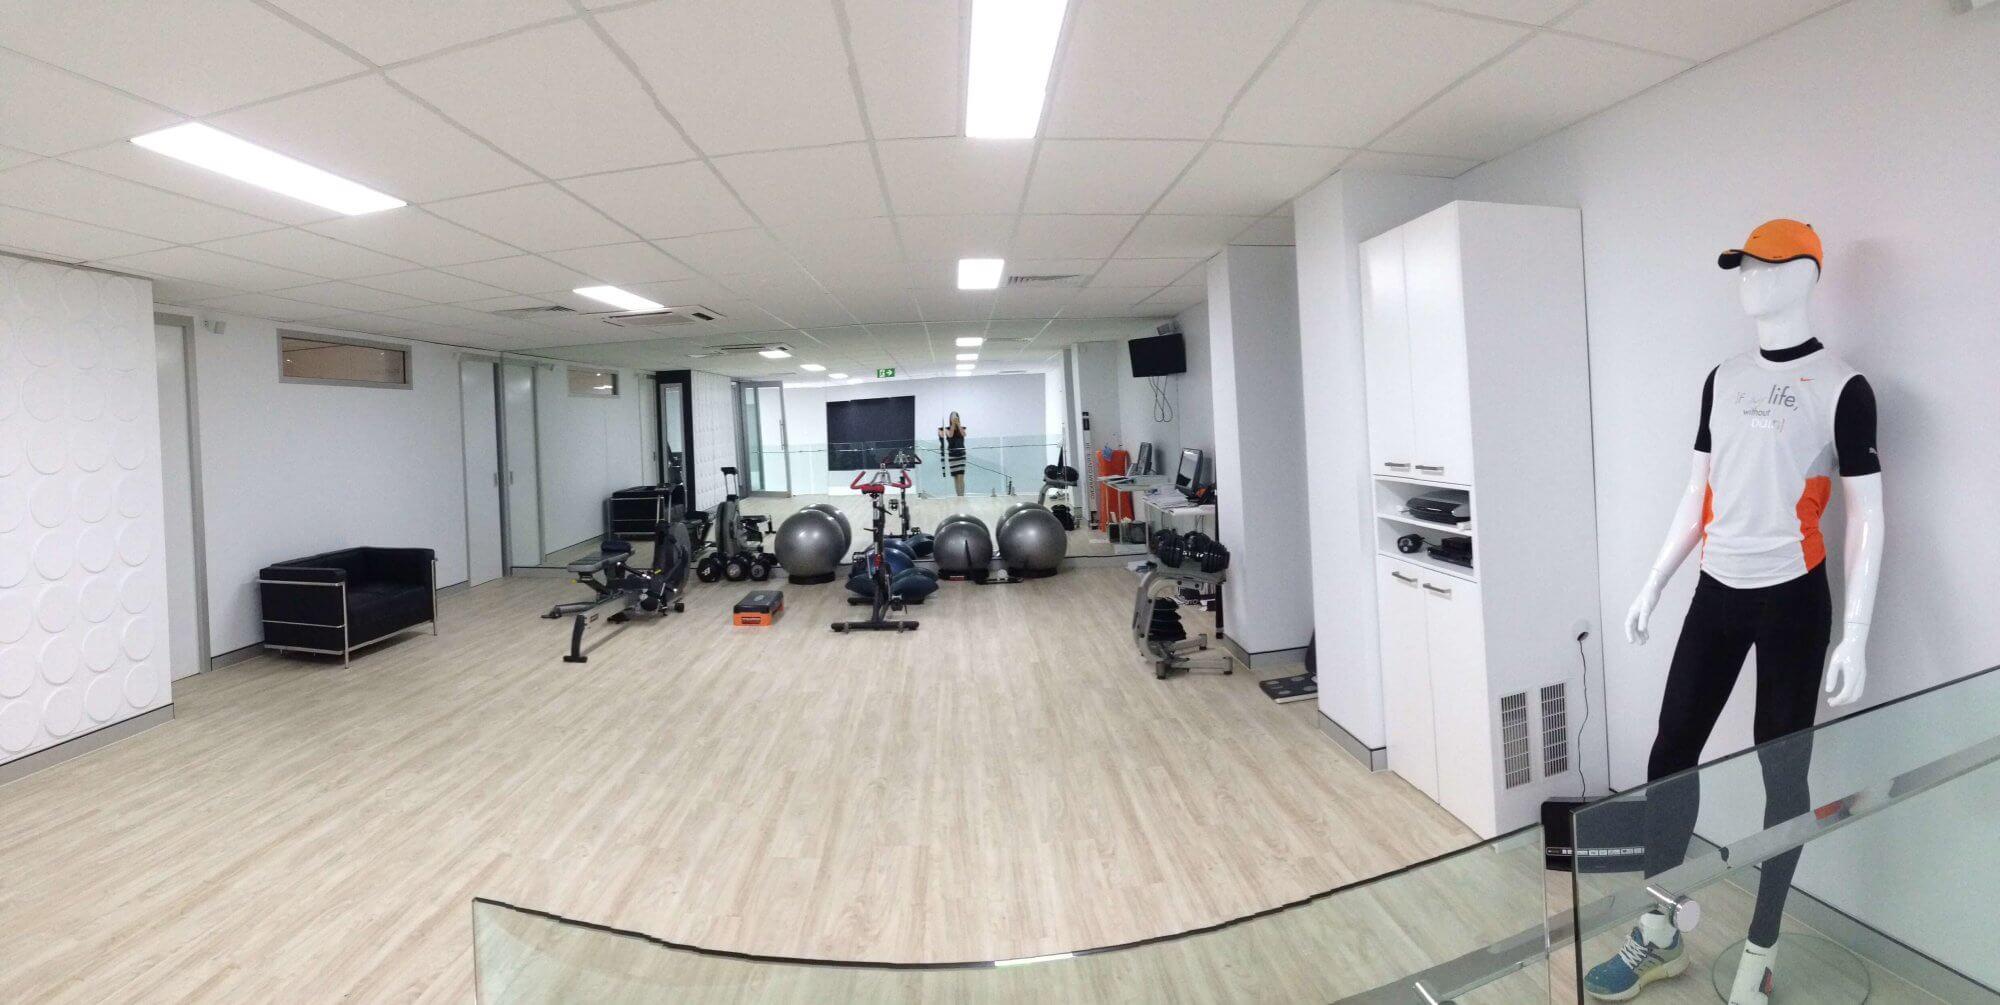 Pilates professional space